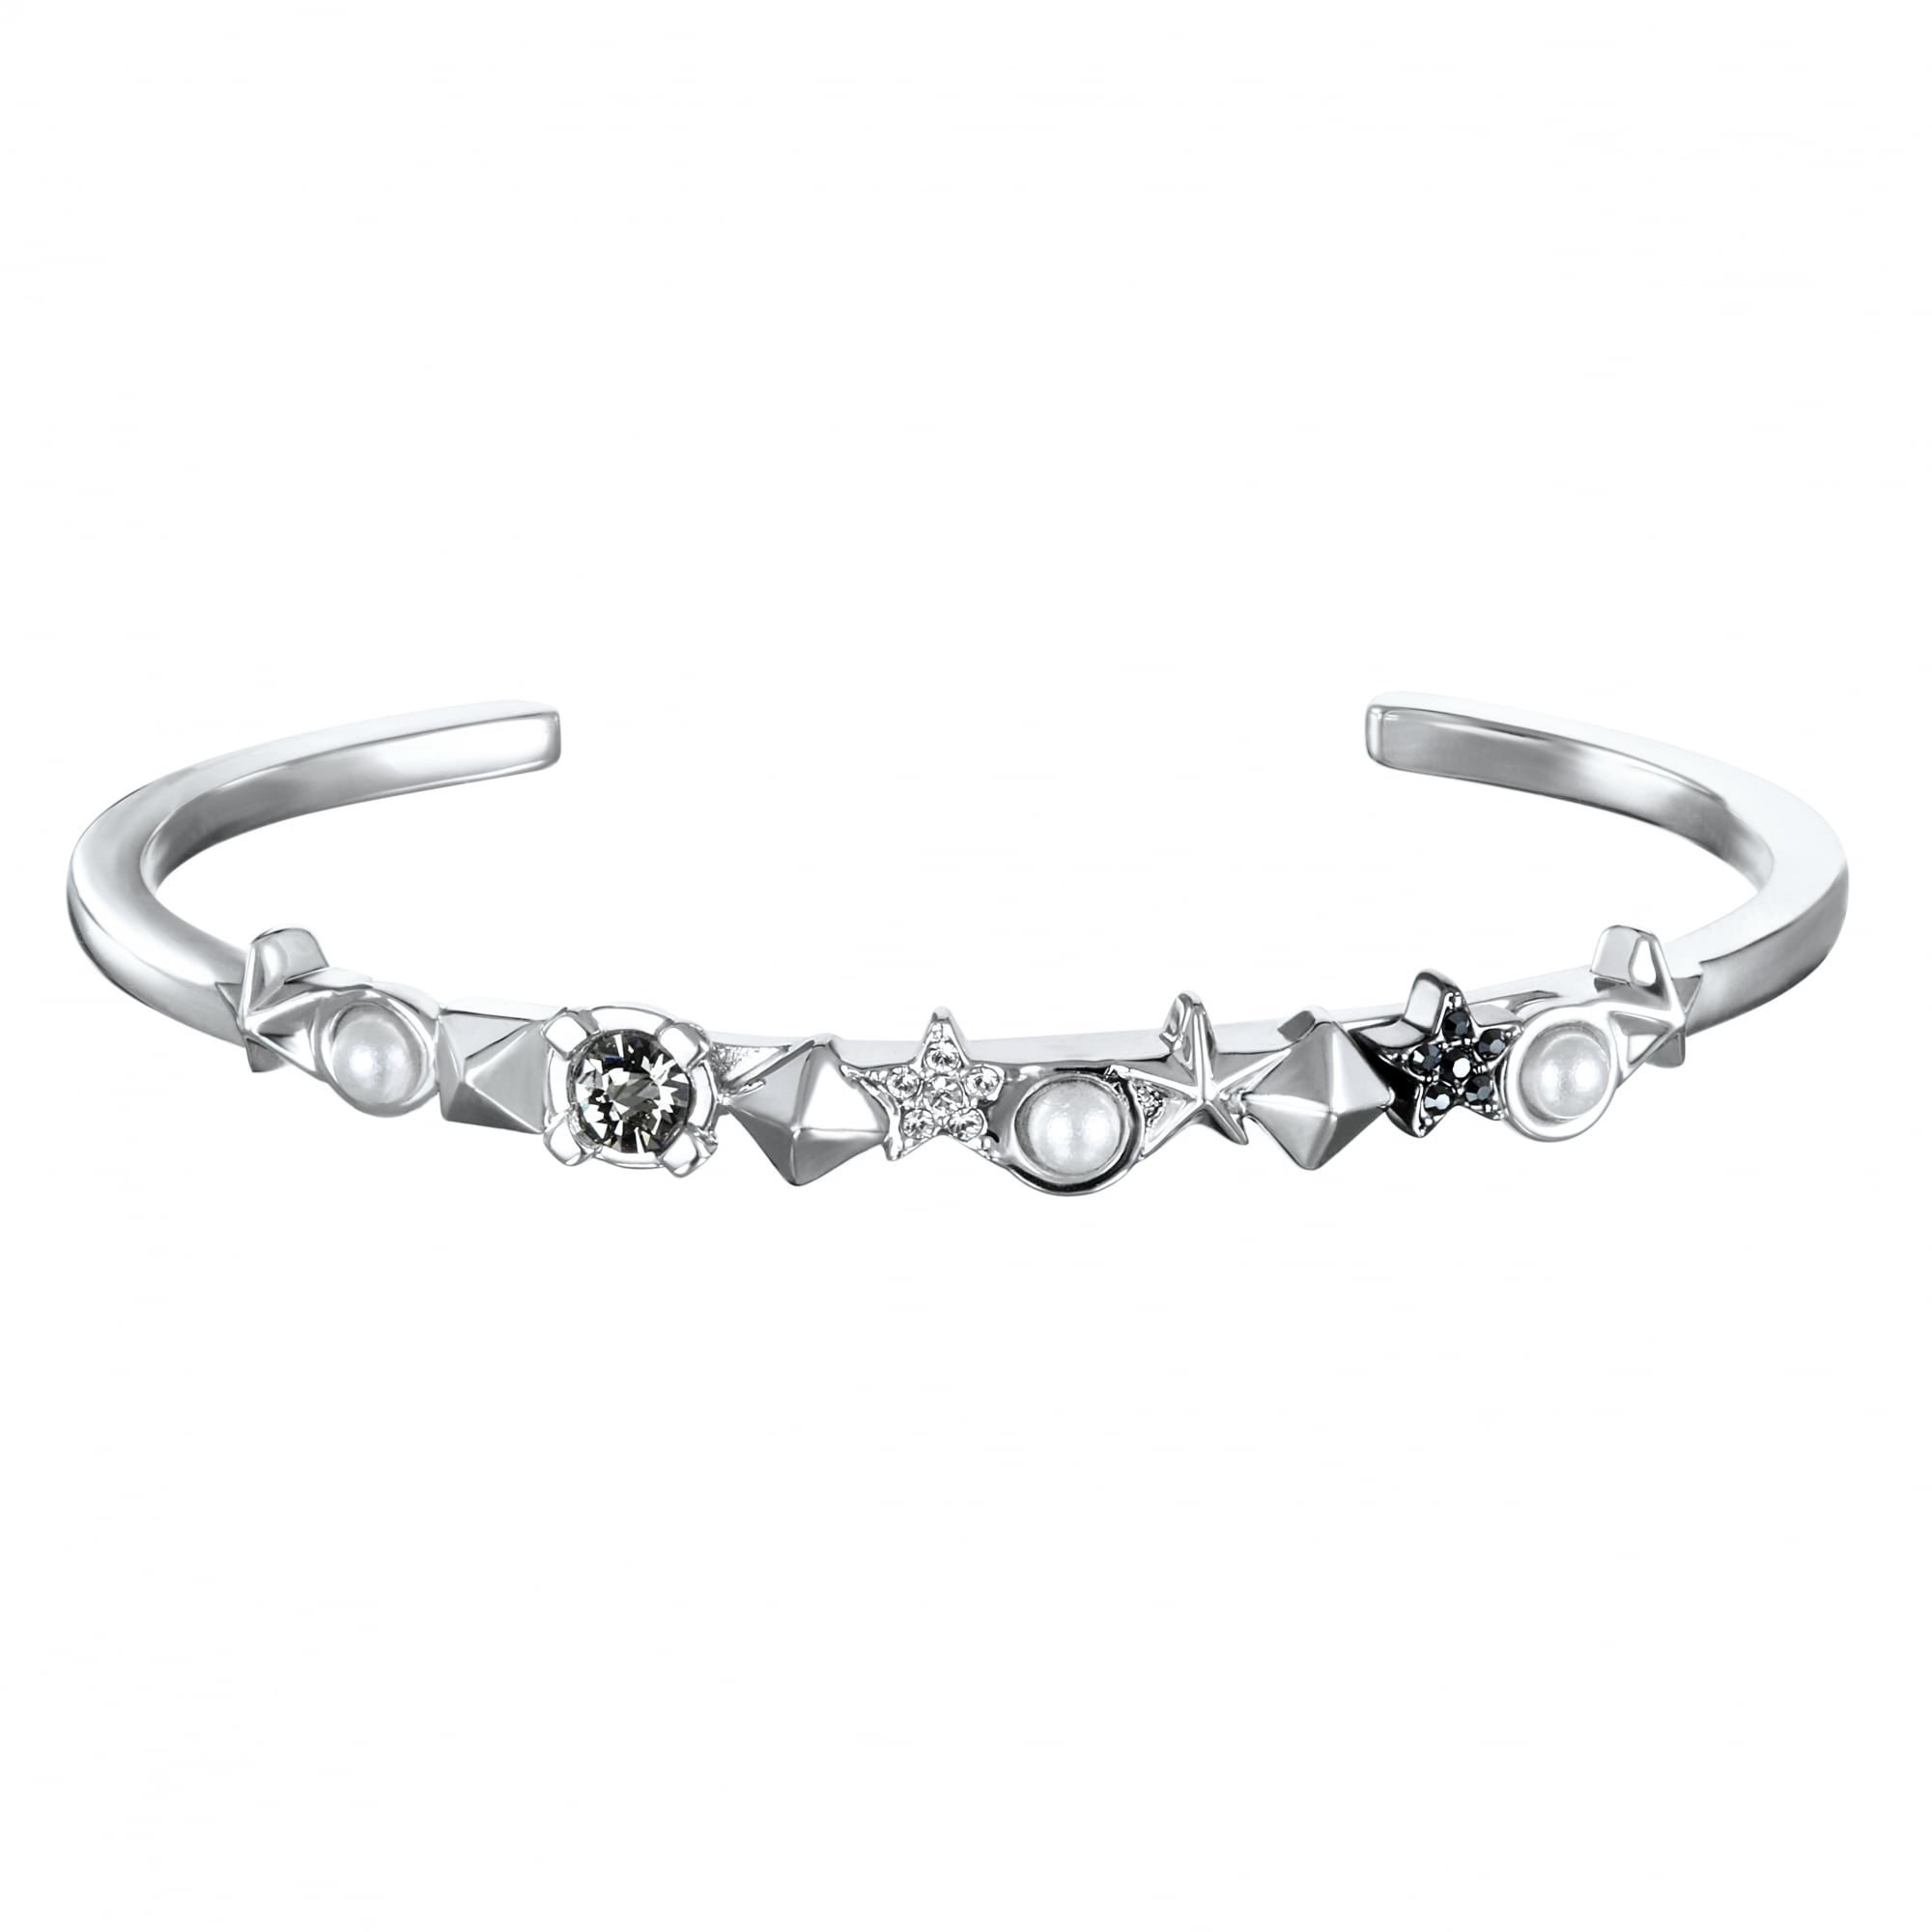 30387f65e0e7 Karl Lagerfeld Silver Star And Stud Bar Cuff Bracelet Created With Swarovski®  Crystals